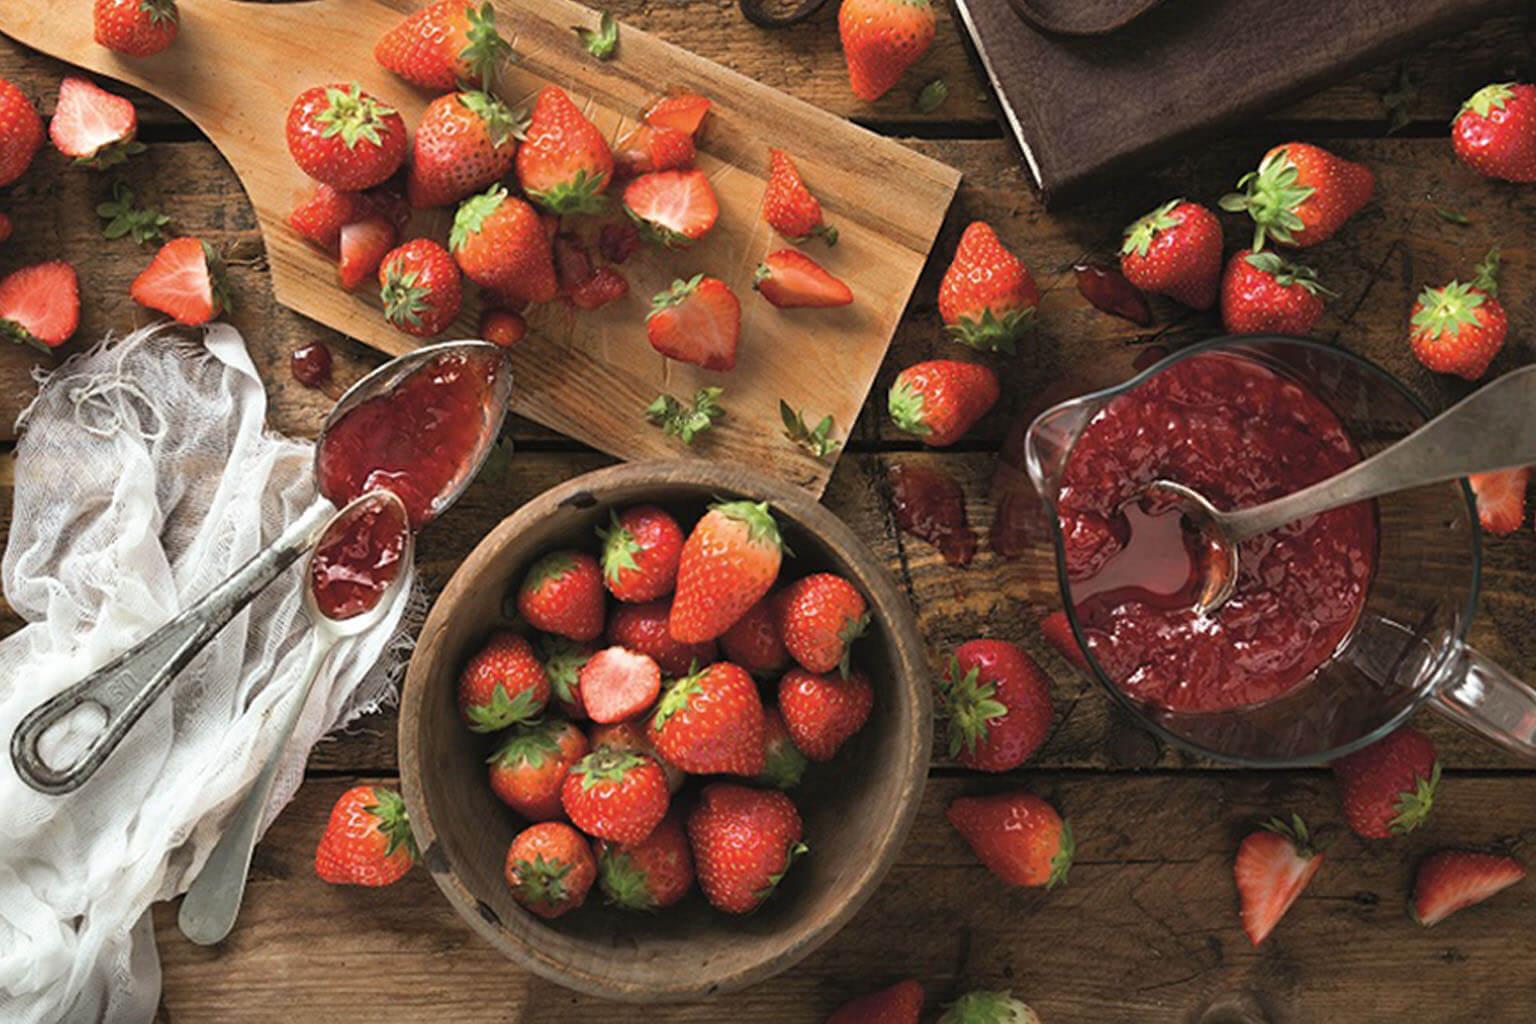 thumbnail image of strawberries